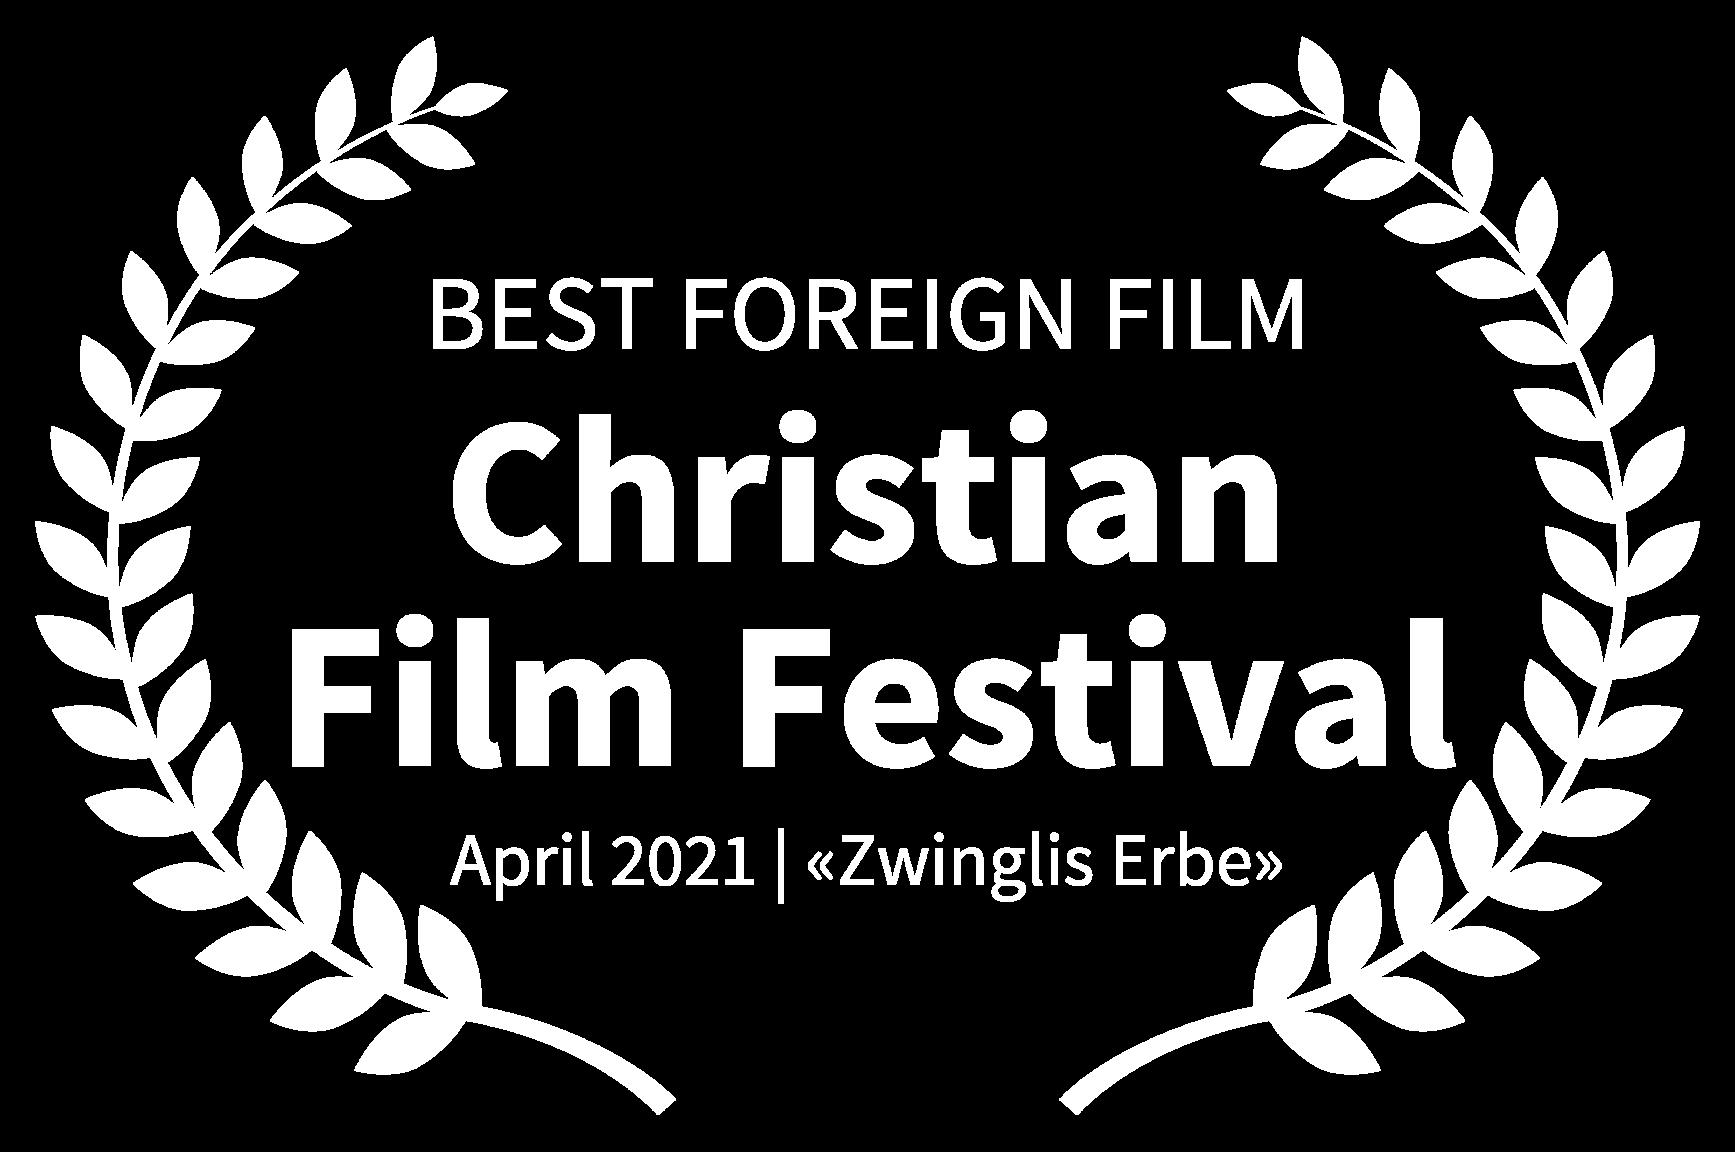 BEST FOREIGN FILM - Christian Film Festival - April 2021 Zwinglis Erbe